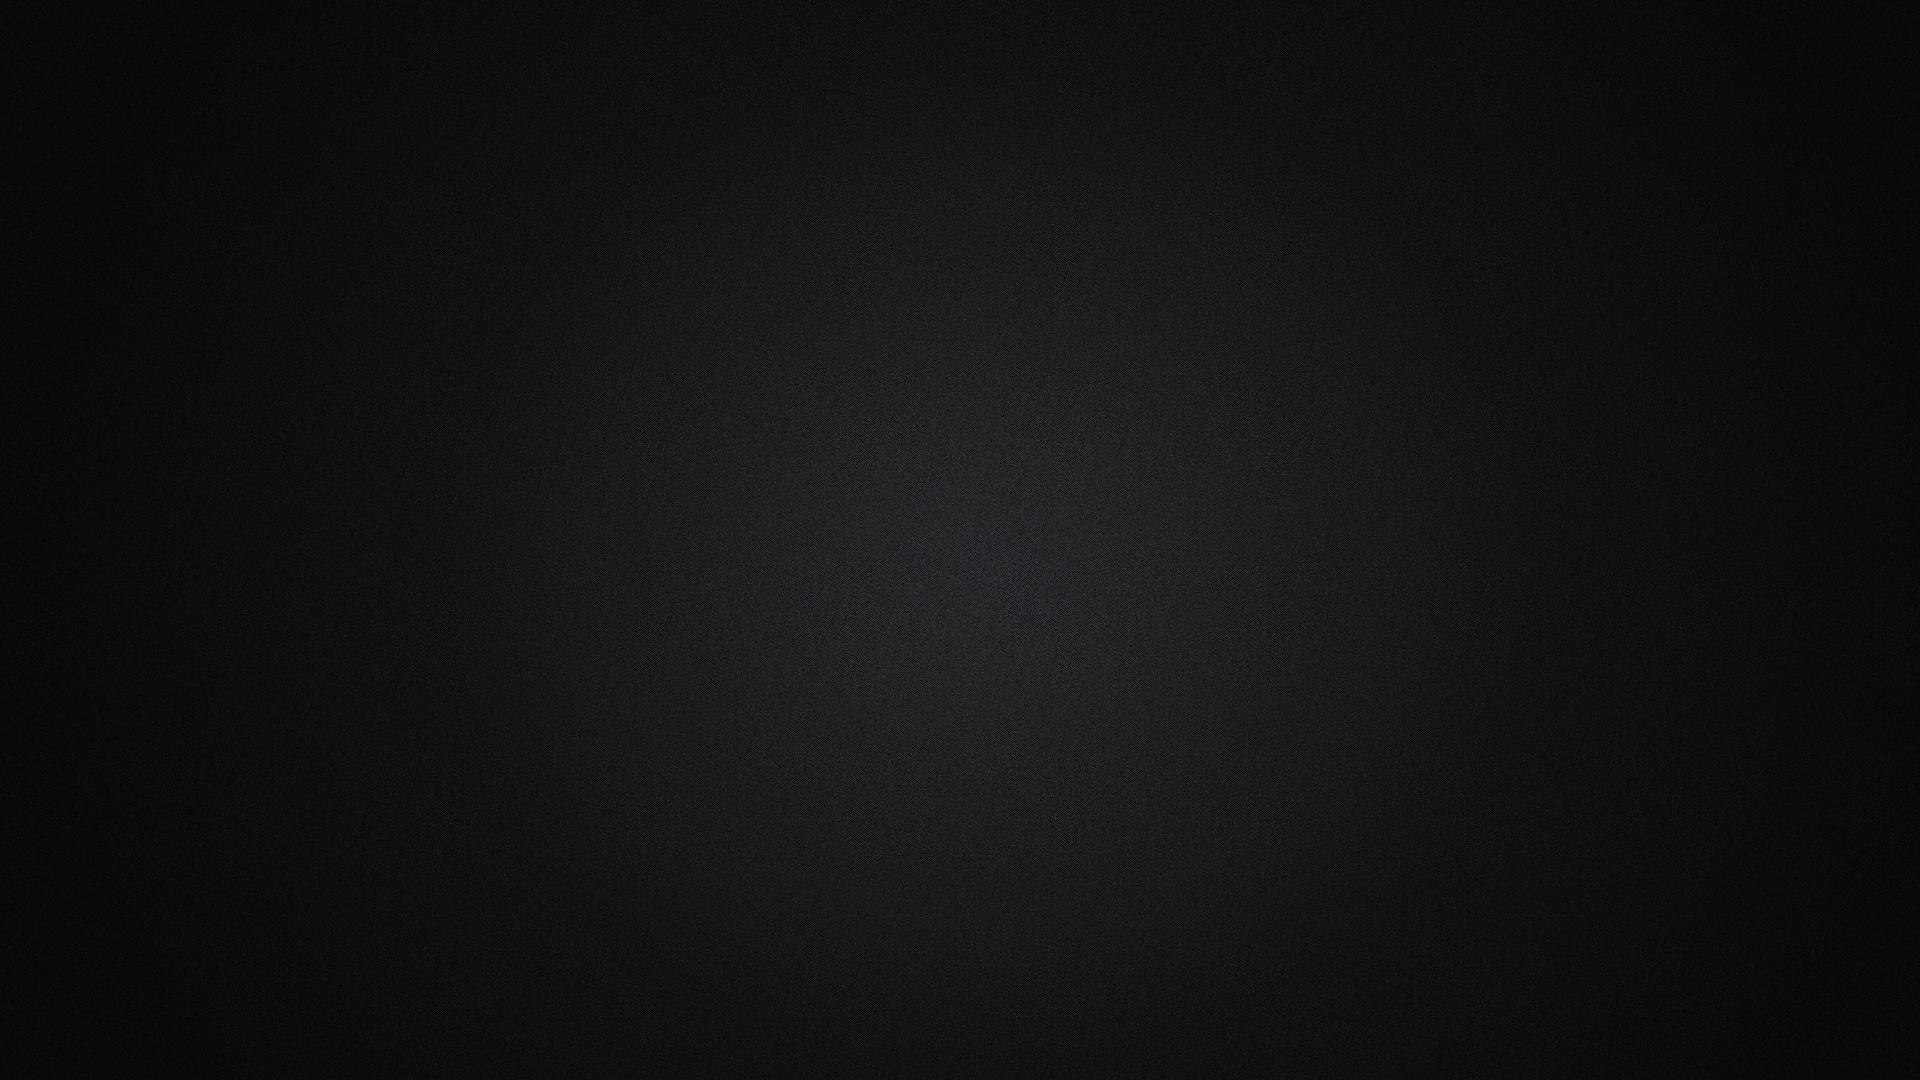 Windows 10 Black Wallpaper Posted By Ryan Walker